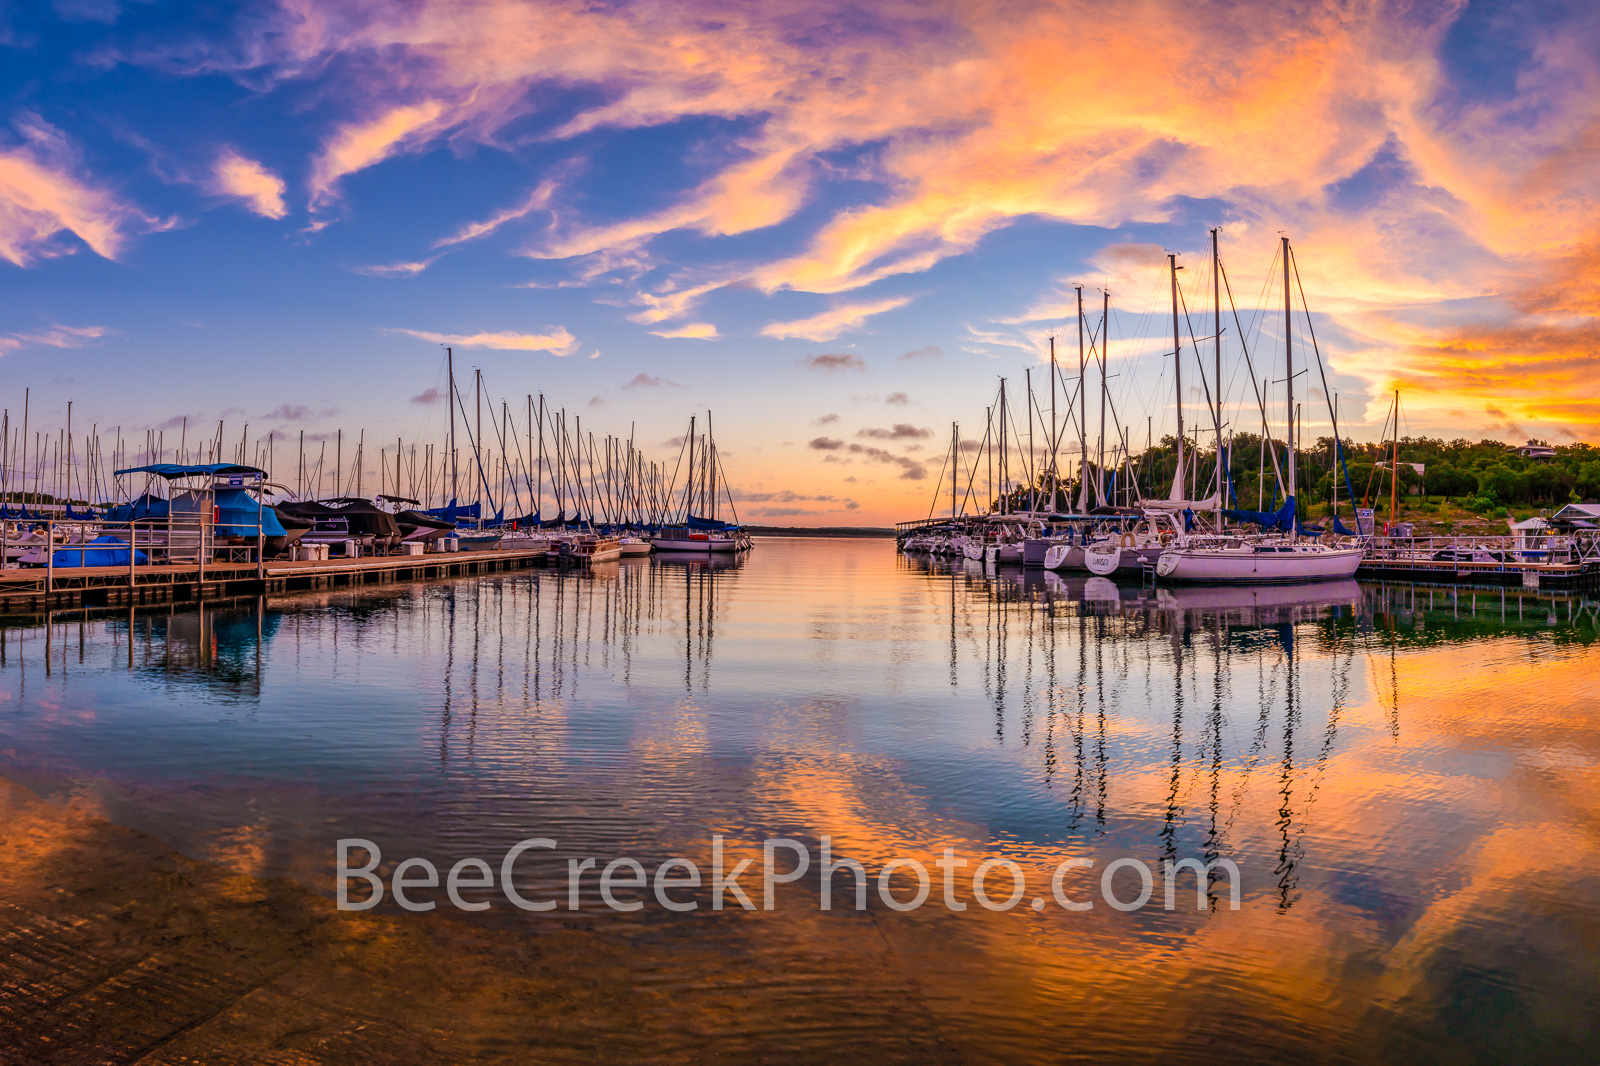 Lake Travis Sunrise Reflections Landscape - We captured this beautiful sunrise landscape over the marina on Lake Travis in the...